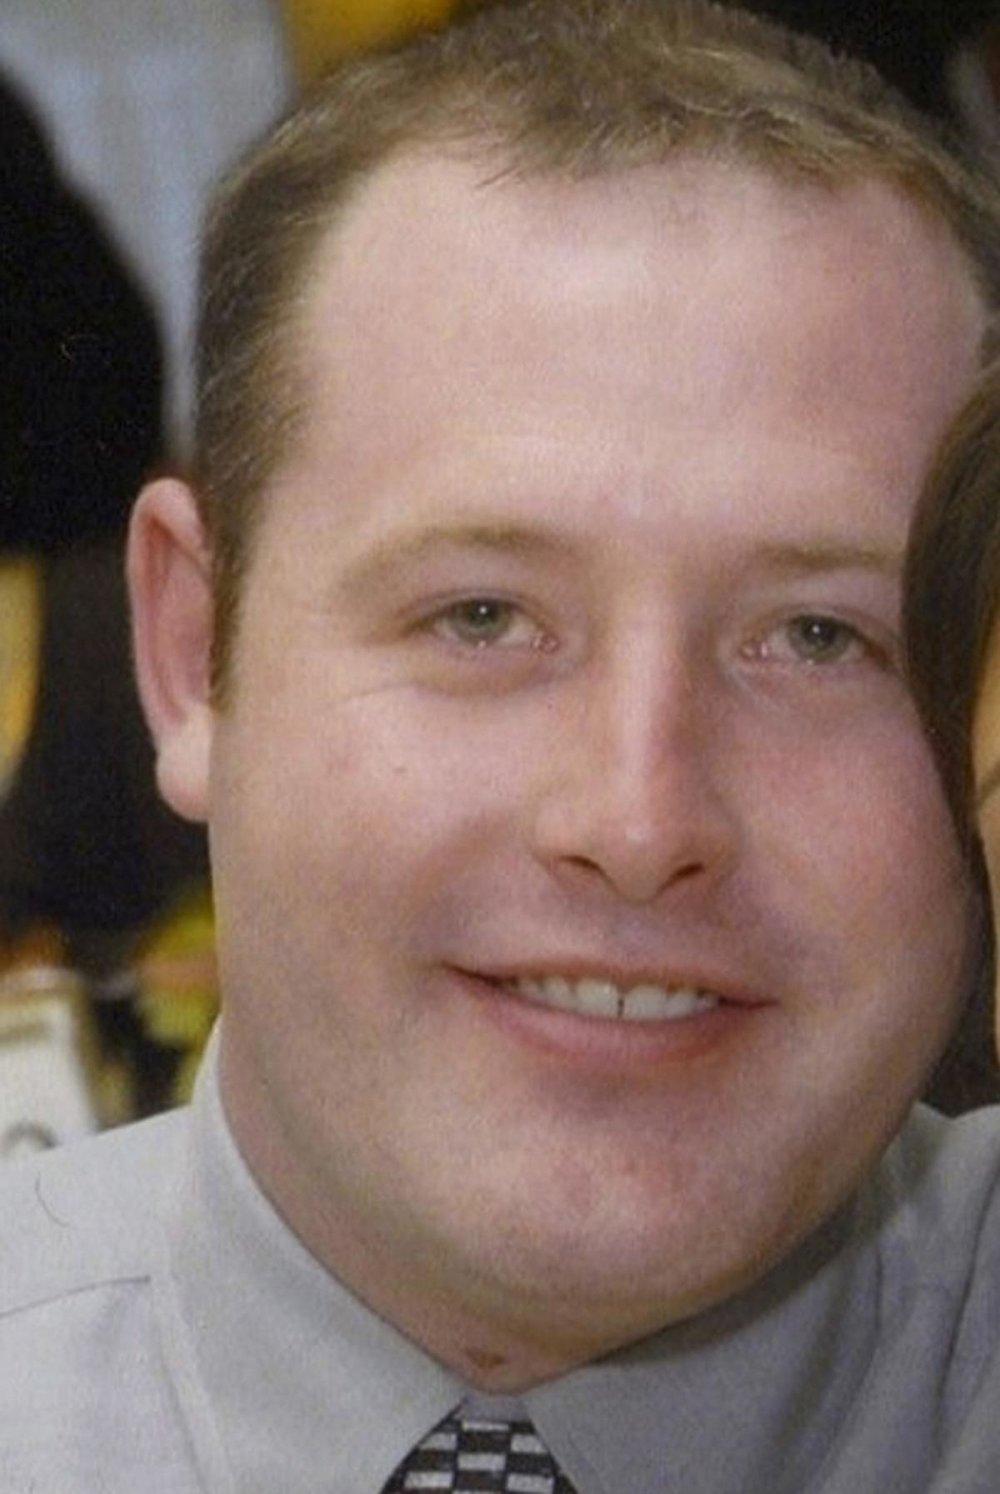 Sgt.Paul Tuozzolo; Photo: Facebook